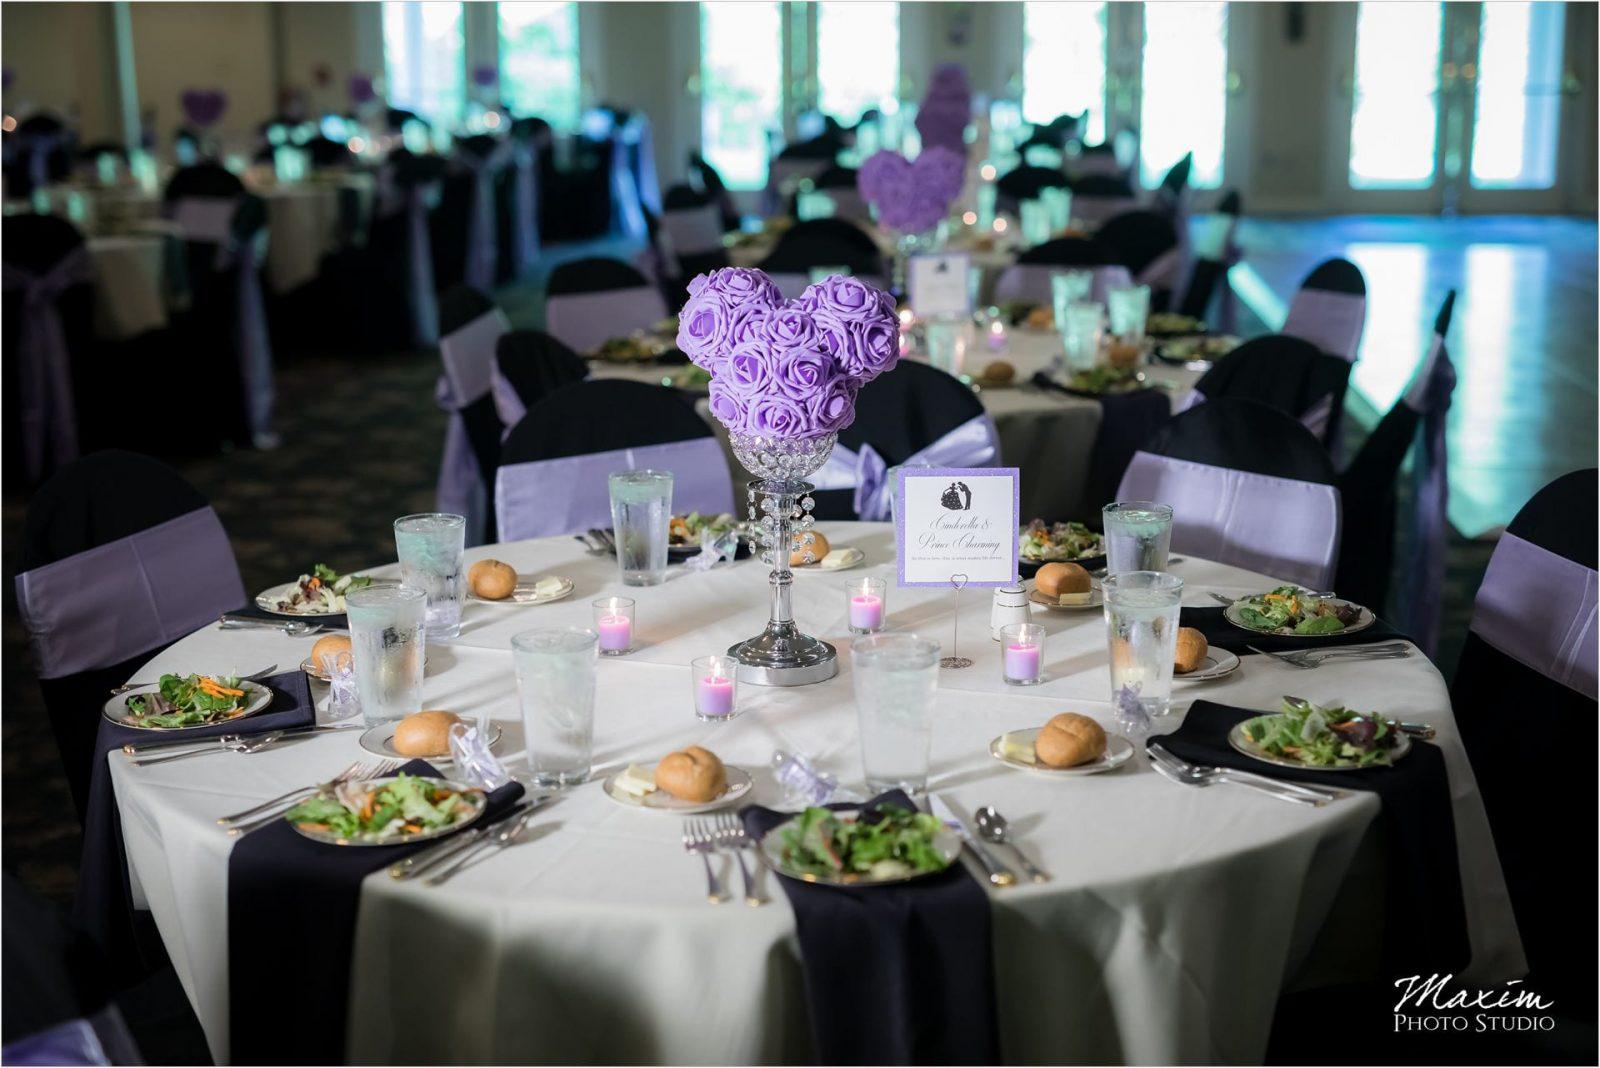 Norlyn Manor, Bride Groom, Sunset wedding, Cincinnati Wedding Photography, Reception table